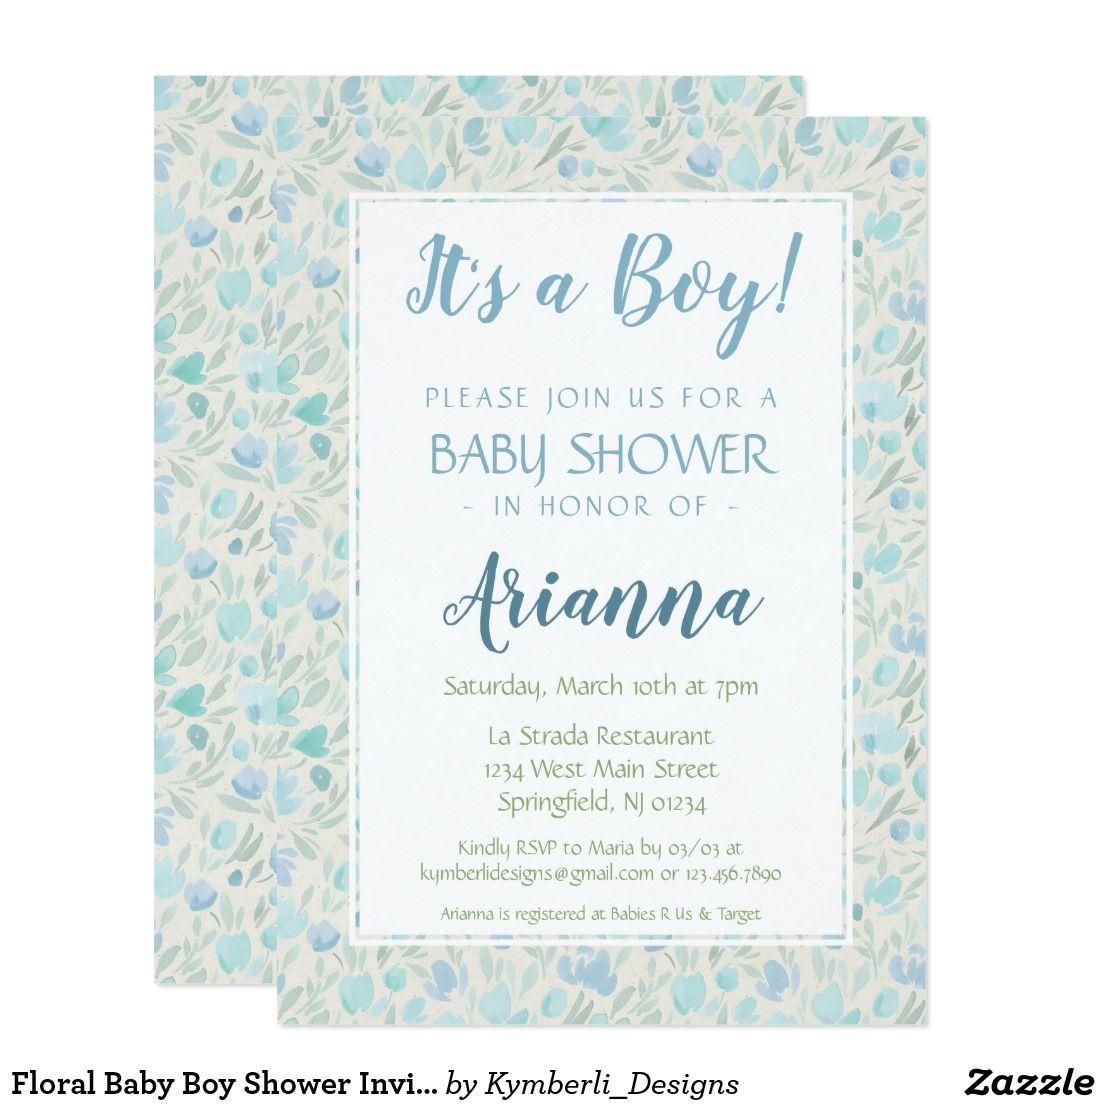 Floral Baby Boy Shower Invitation Zazzle Com Baby Shower Invitations For Boys Floral Baby Baby Boy Shower